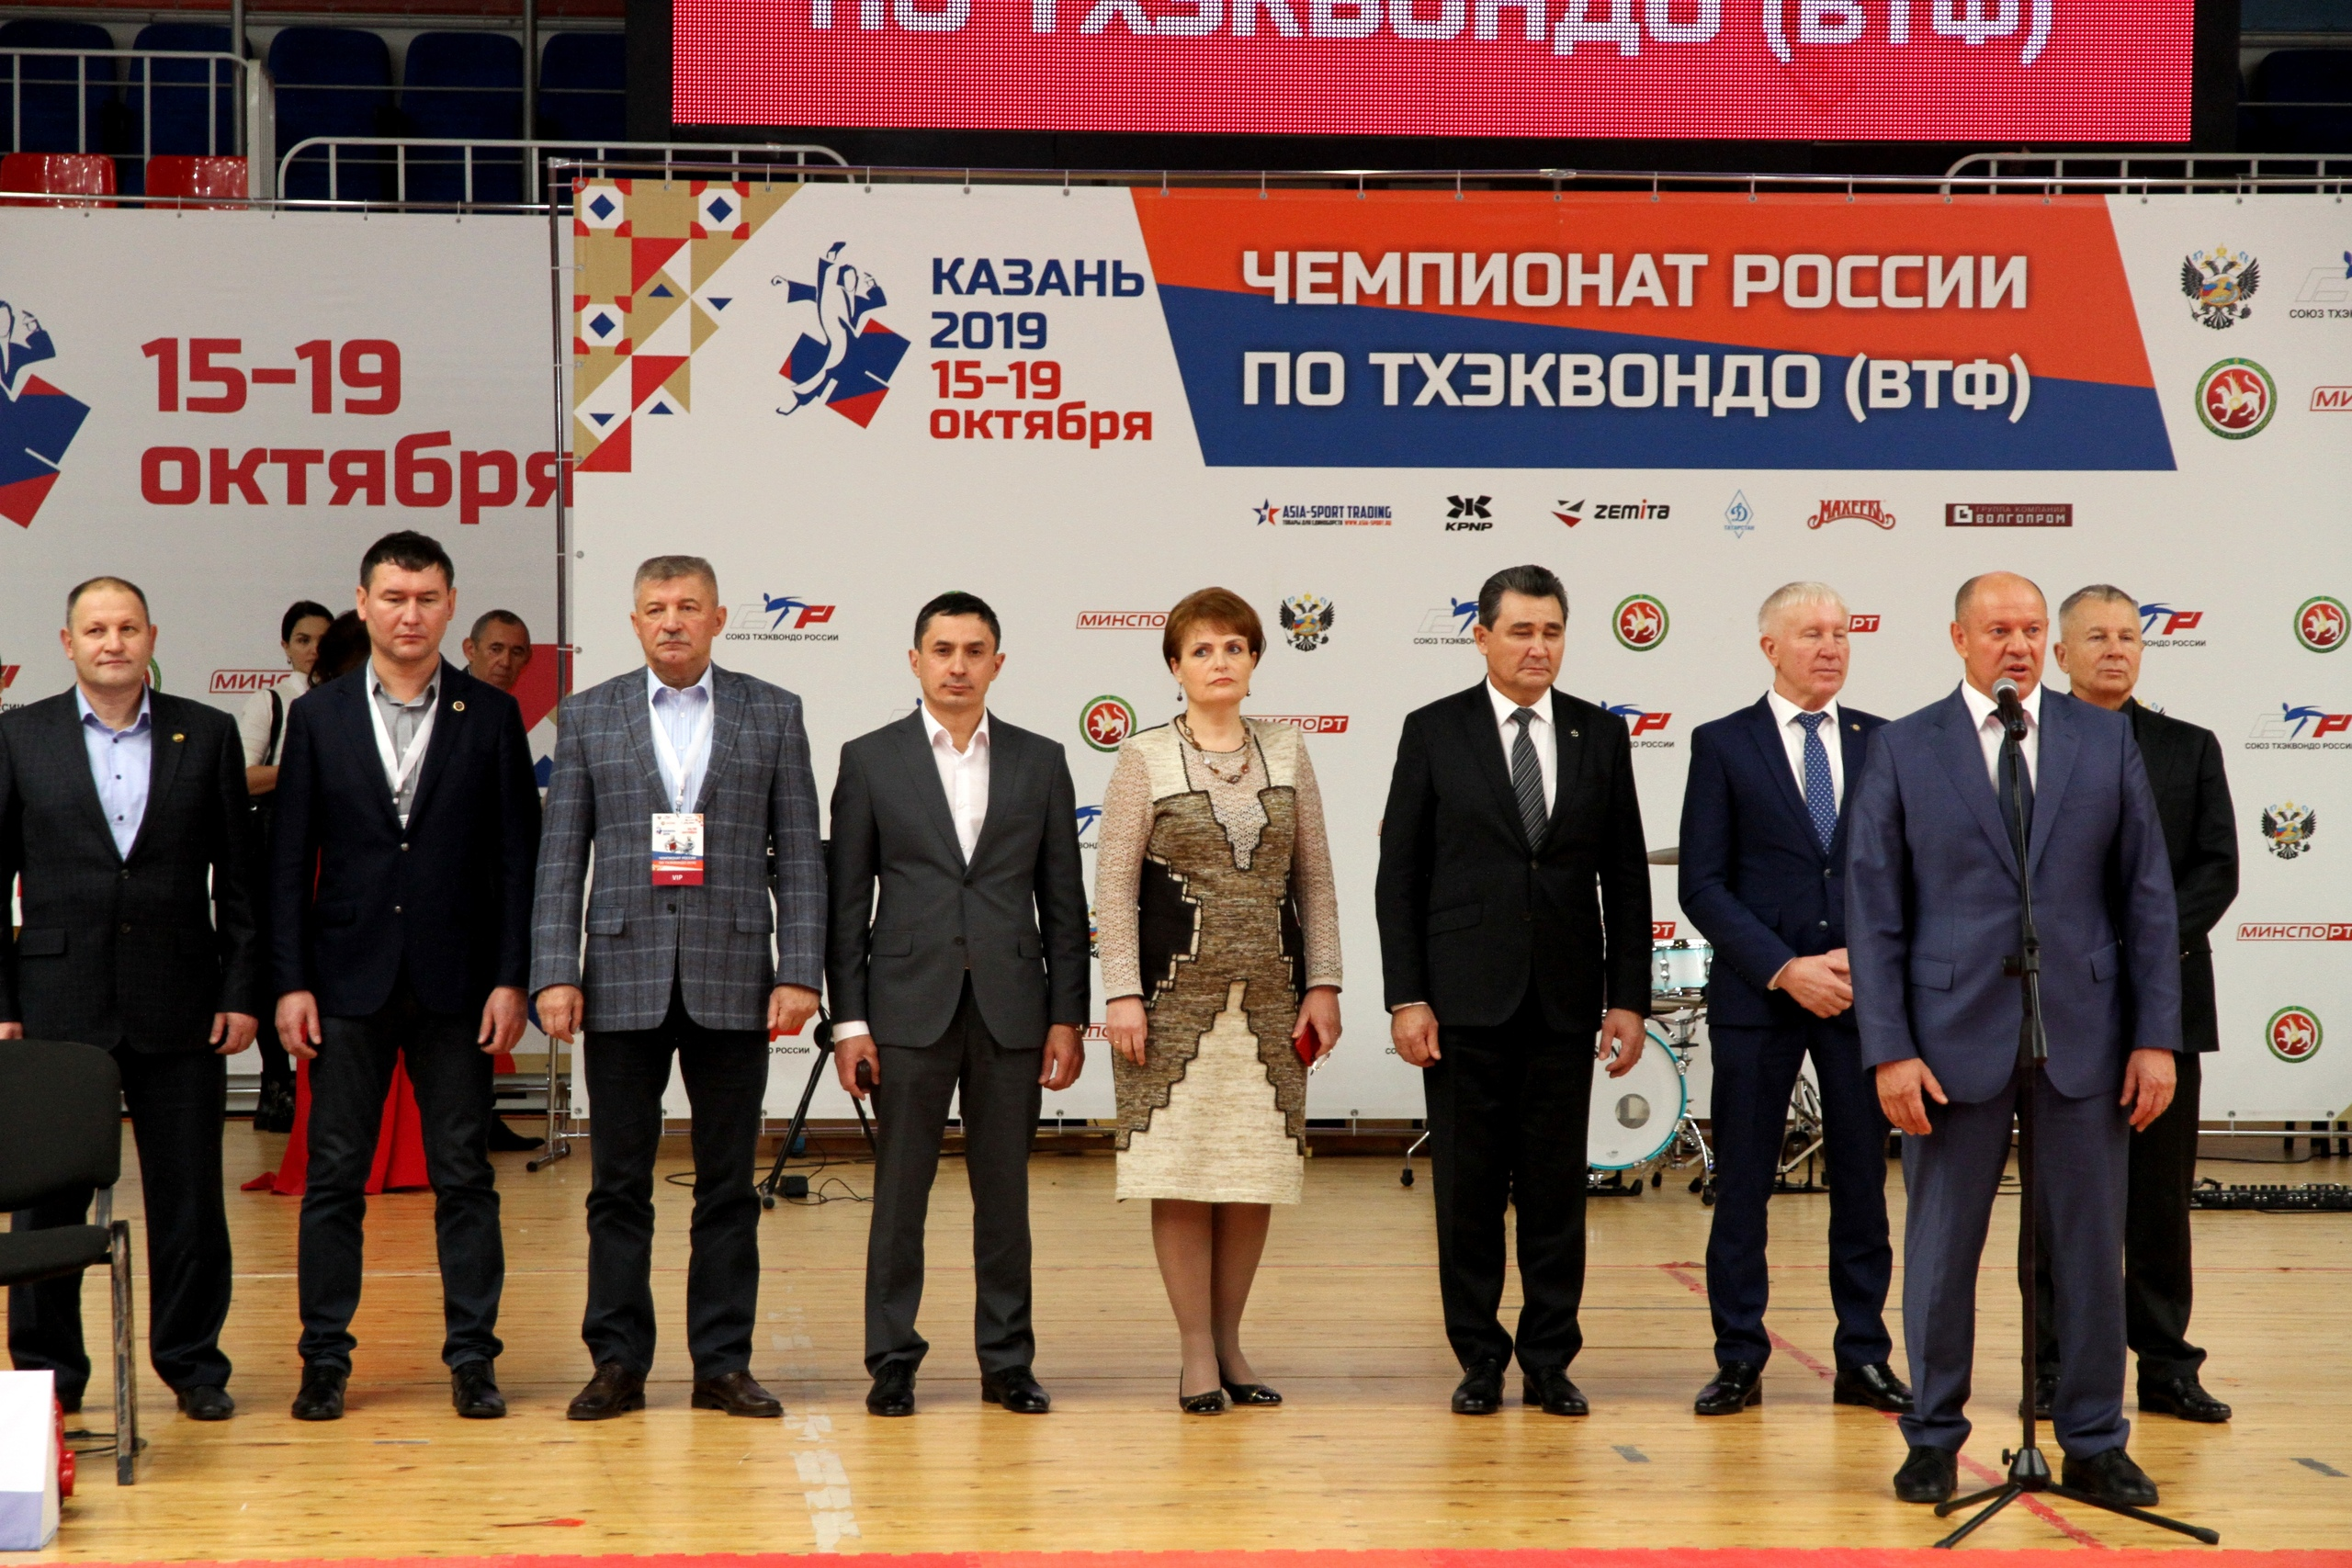 Kazan-2019